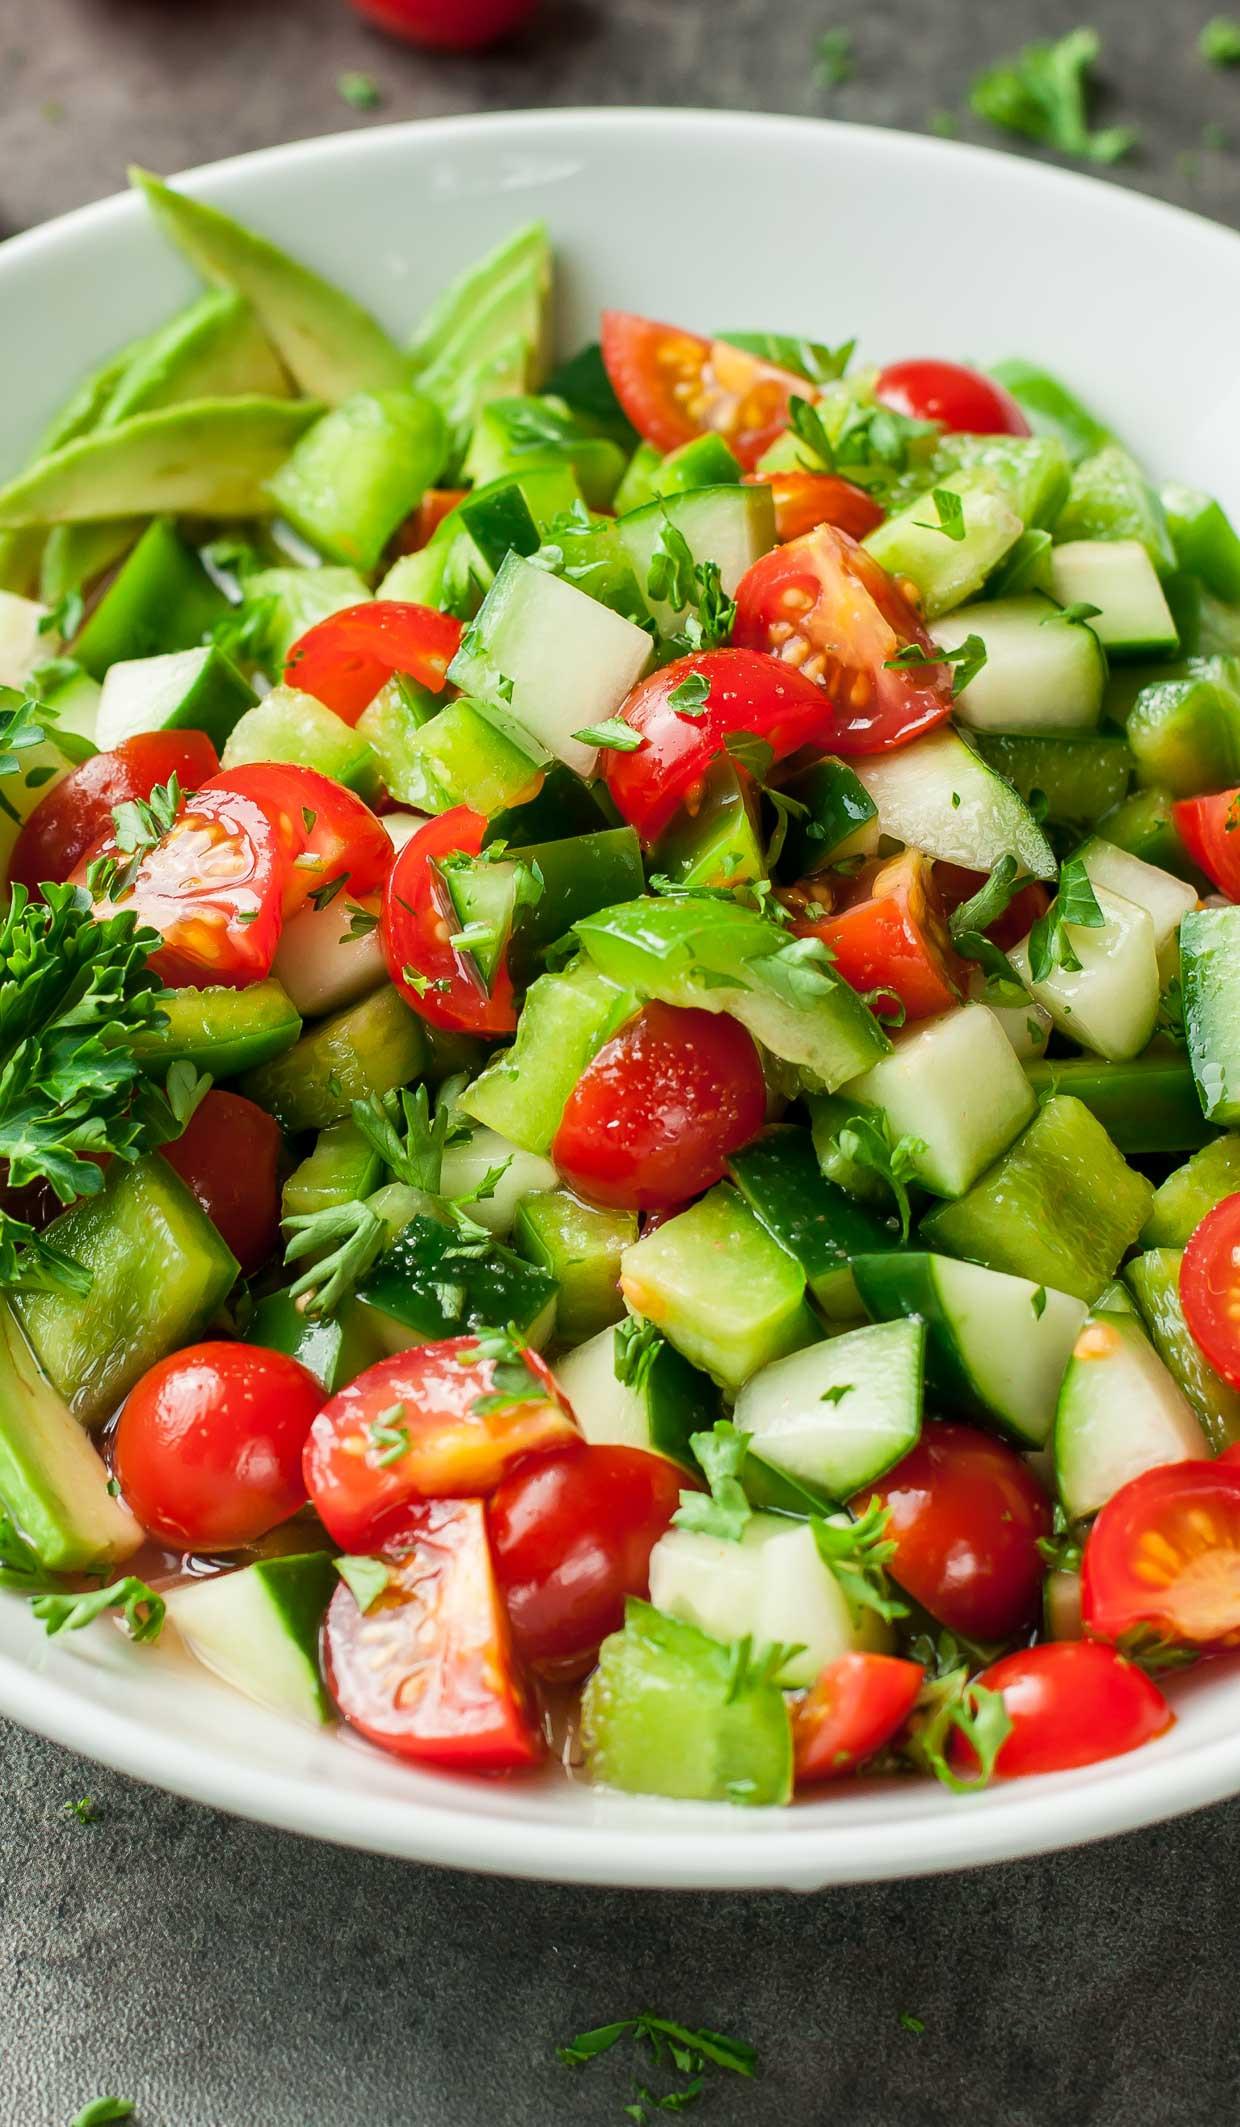 Tomato Salad Recipe  Healthy Tomato Cucumber Avocado Salad